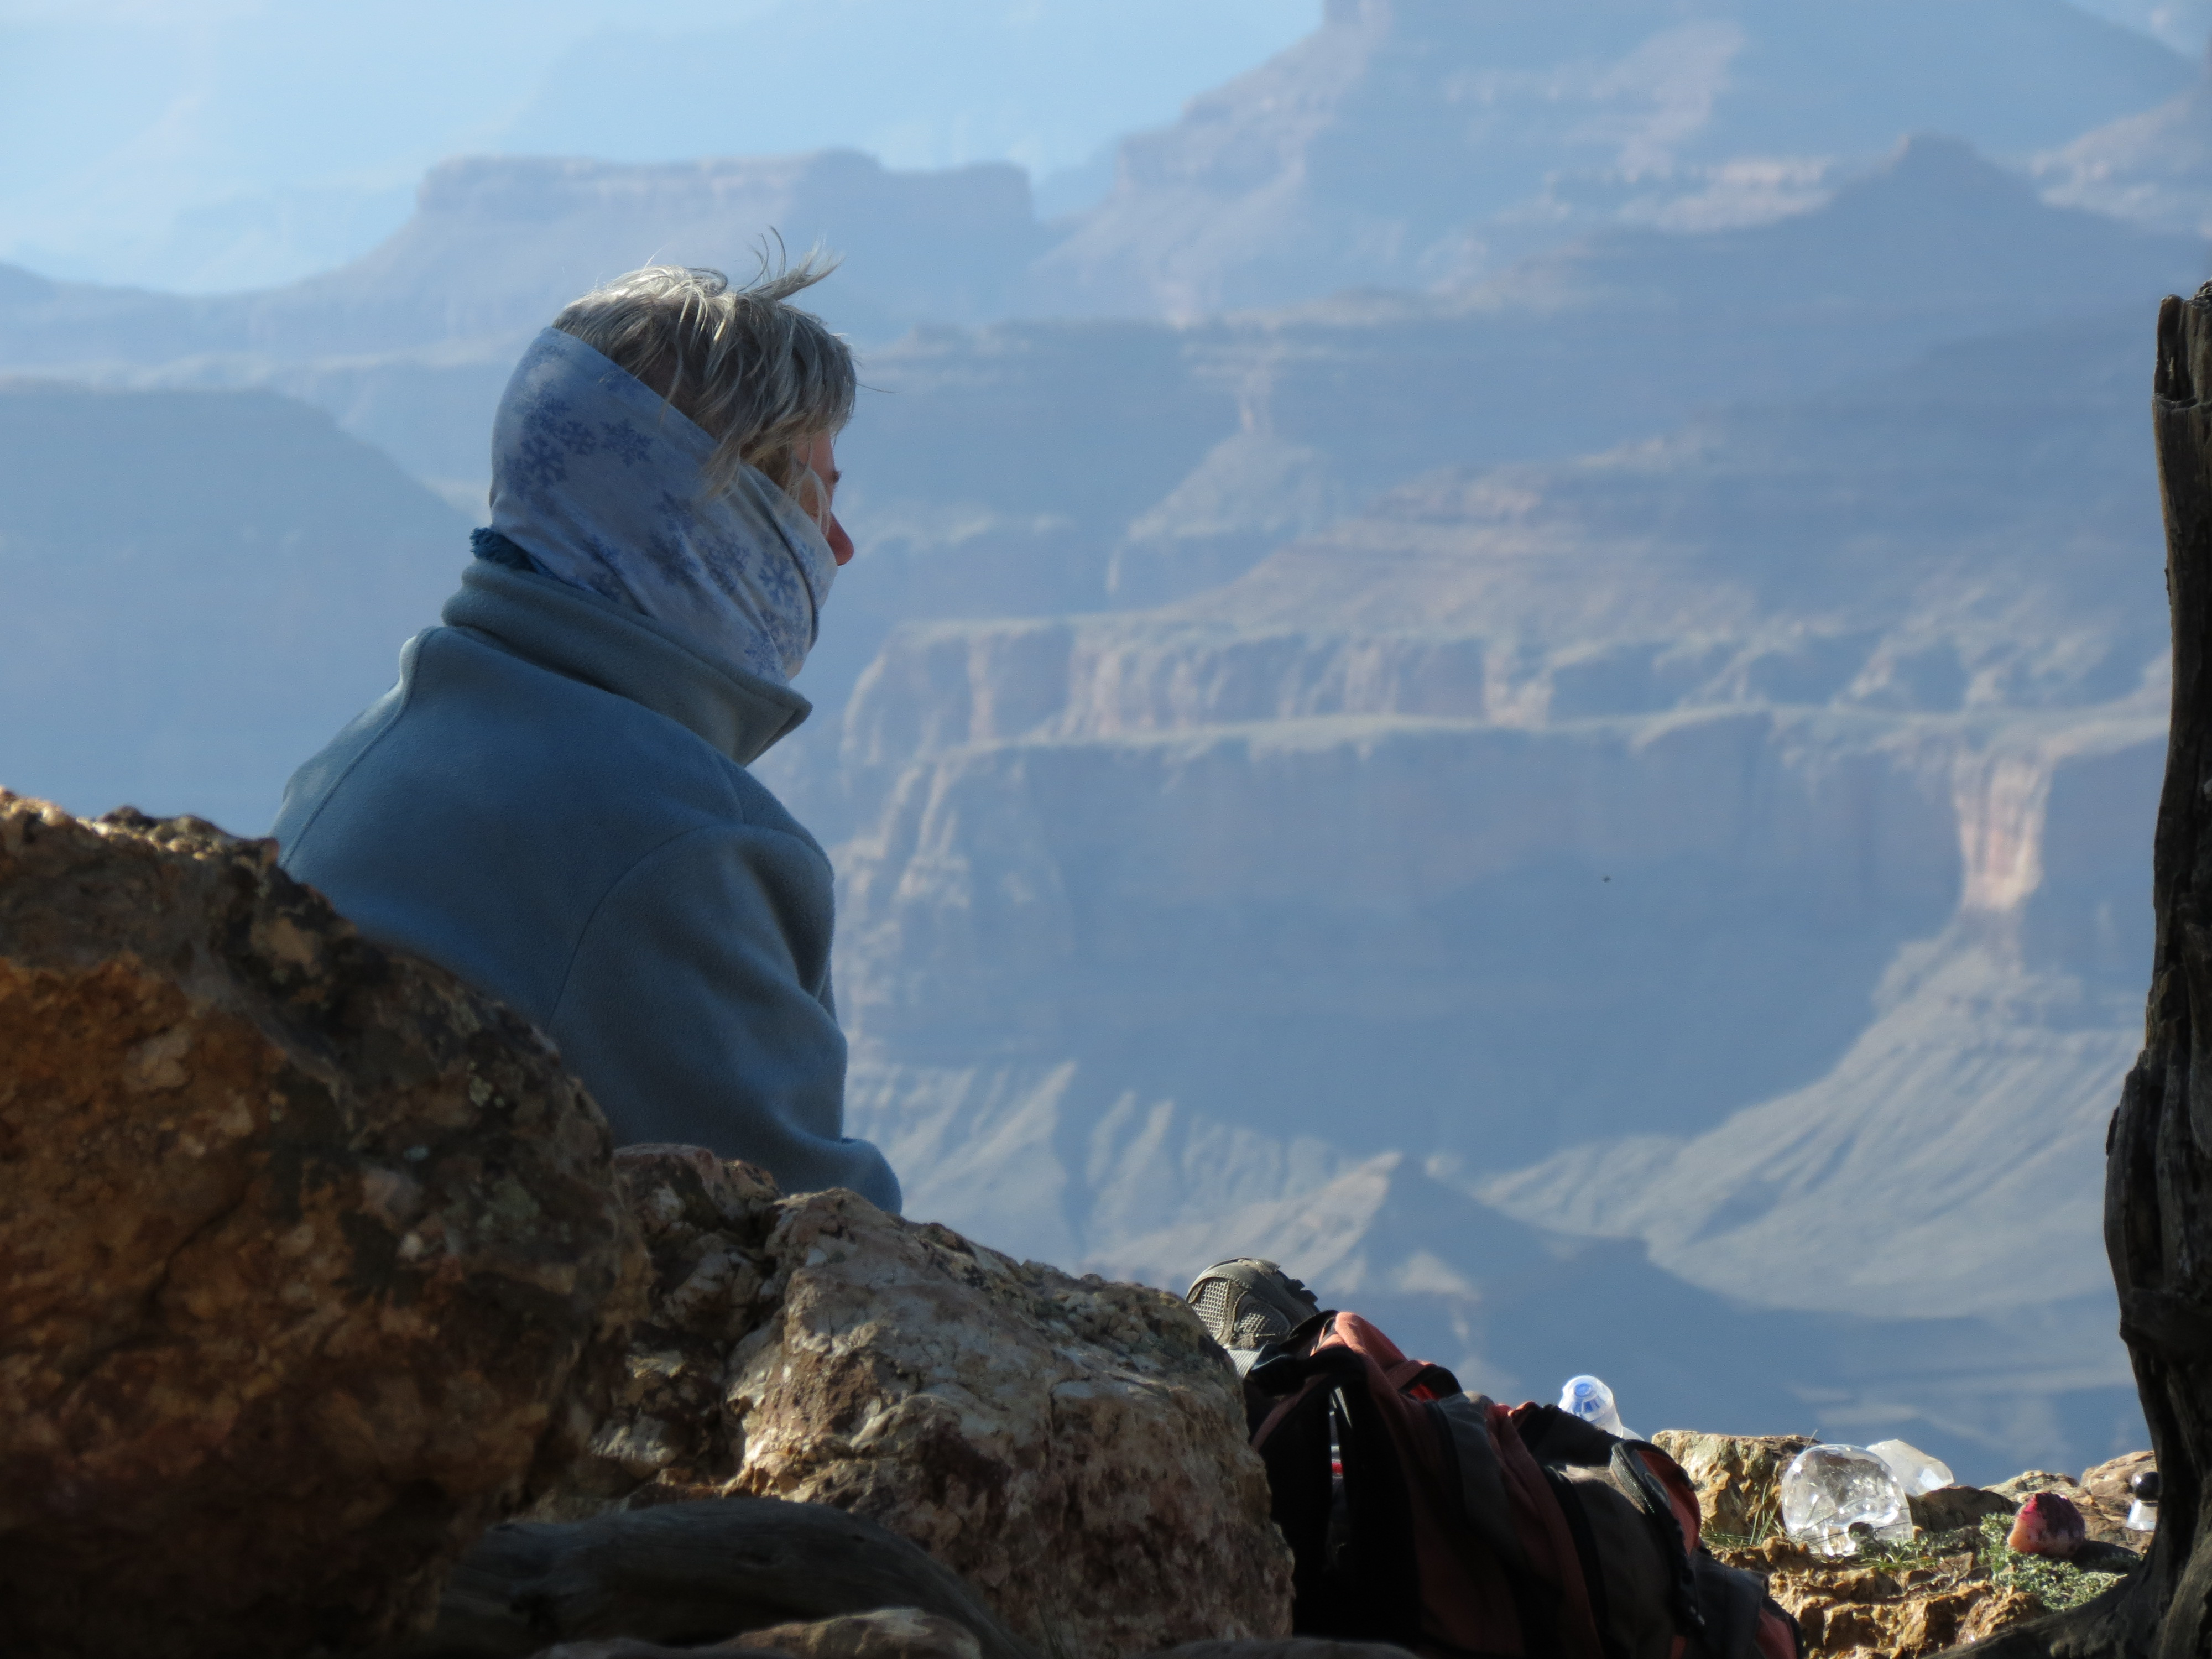 Woman Meditates at the Edge